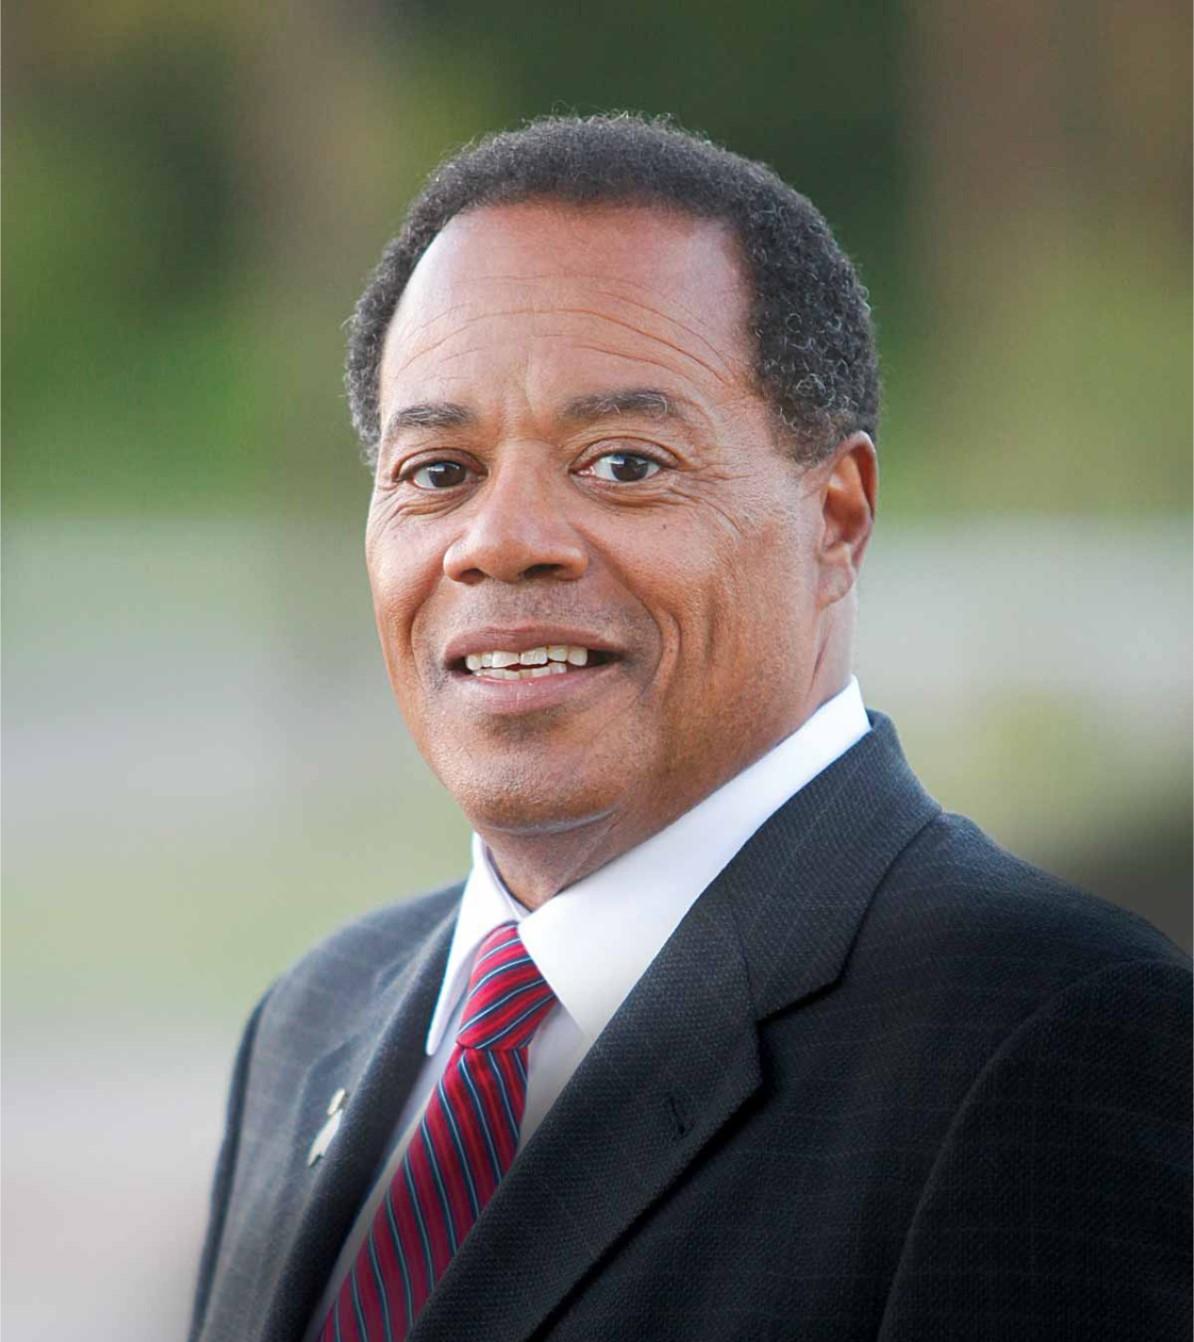 Pastor Stephen Broden